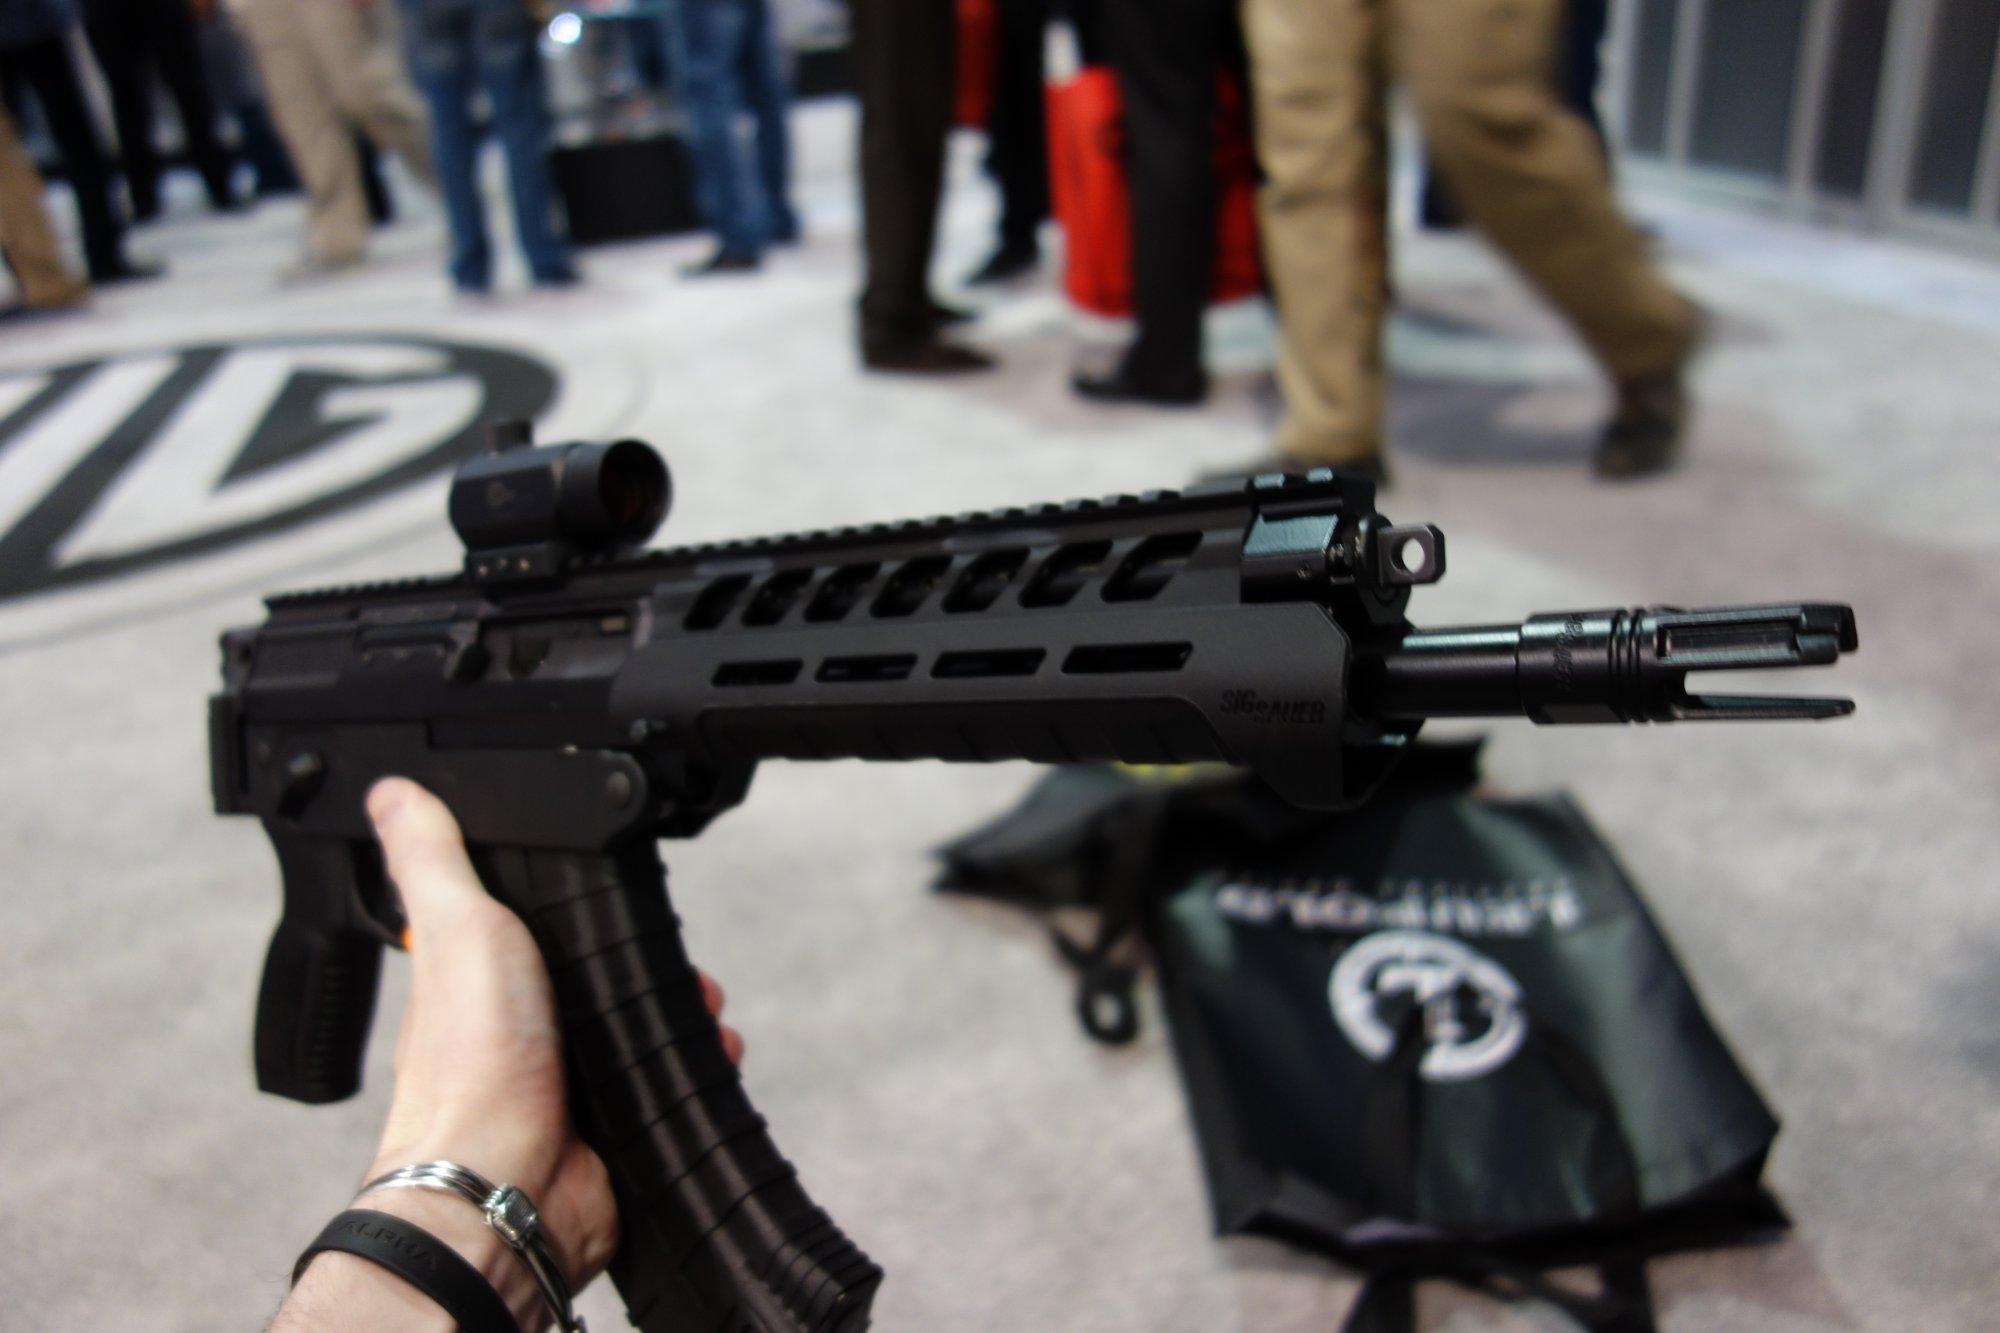 SIG SAUER SIG556xi 7.62x39mm Russian Configuration Semi Auto Only Modular Multi Caliber Combat Tactical Carbine Kalashnikov AK 47 AKM SHOT Show 2014 1 15 14 David Crane DefenseReview.com DR 8 SIG SAUER SIG556xi Modular, Multi Caliber (5.56mm NATO, 300 AAC Blackout/300BLK, 7.62x39mm Russian) Gas Piston/Op Rod Combat/Tactical Rifle/Carbine/SBR with Kalashnikov AK 47/AKM Configuration Capability!